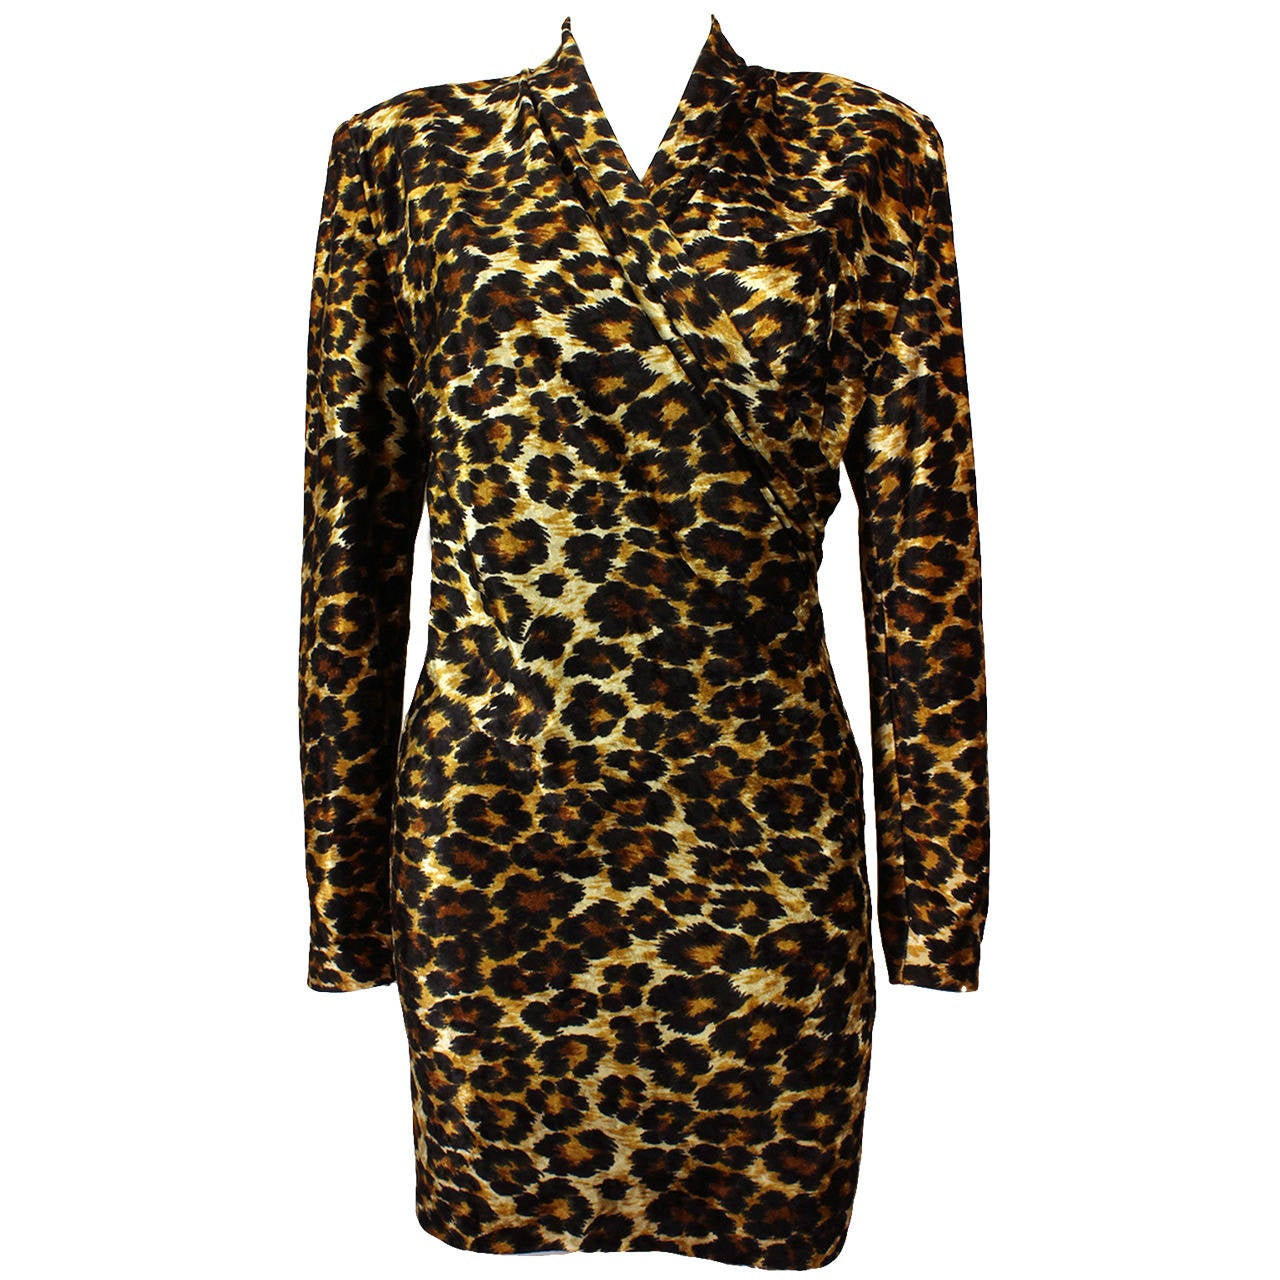 Patrick Kelly Leopard Print Wrap Dress 1